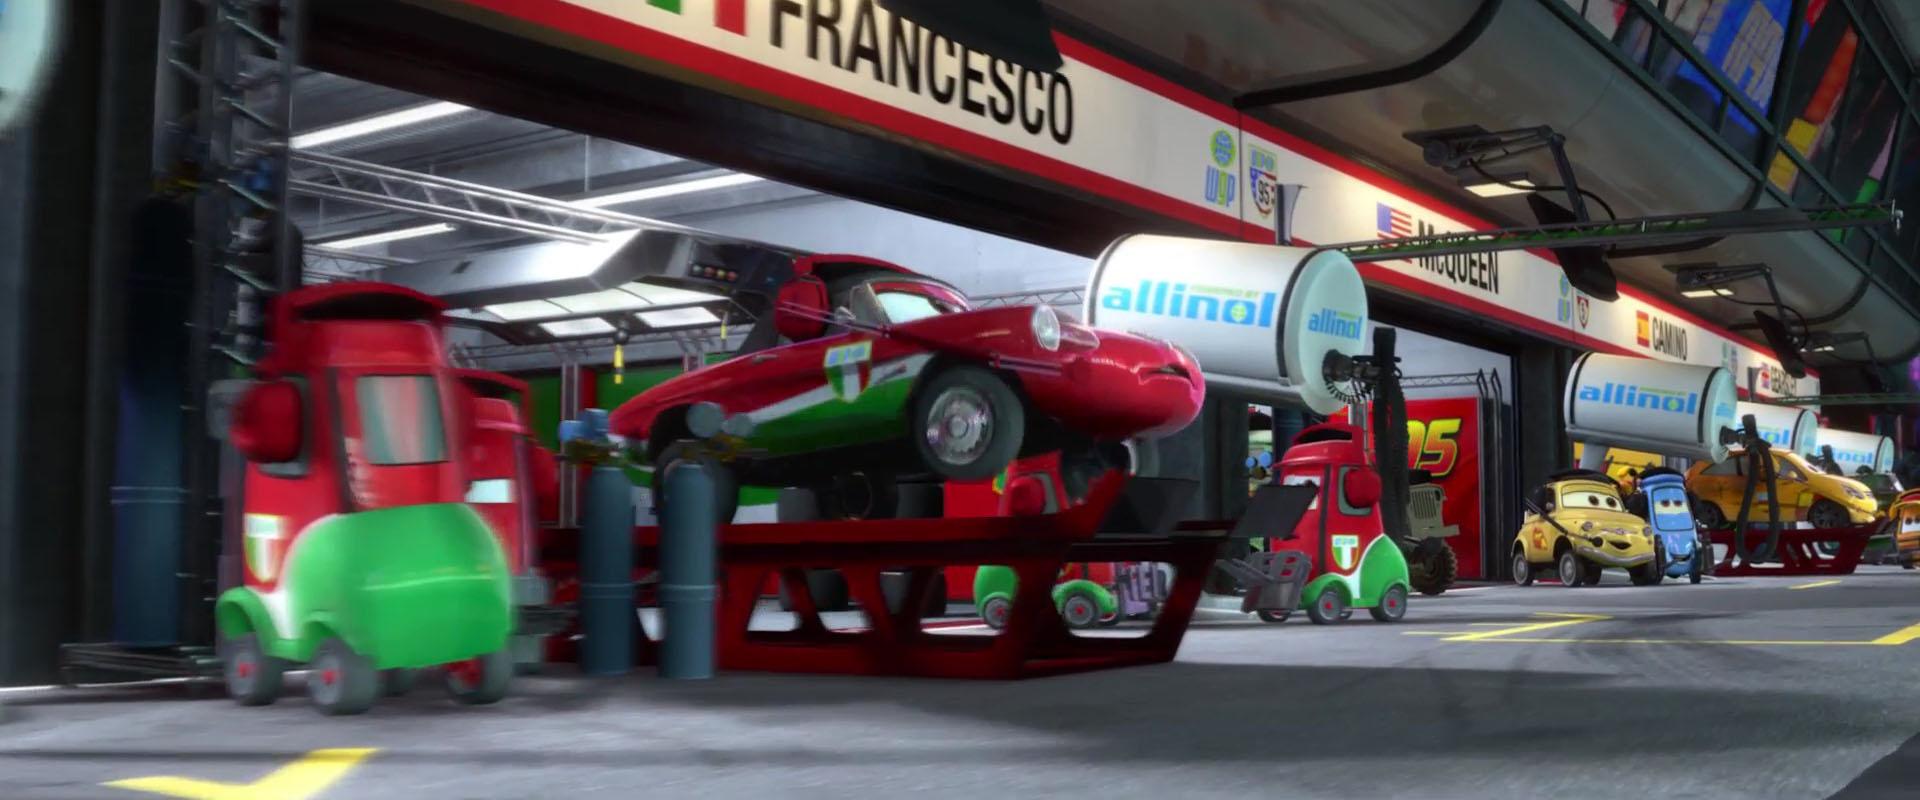 giuseppe motorosi personnage character pixar disney cars 2